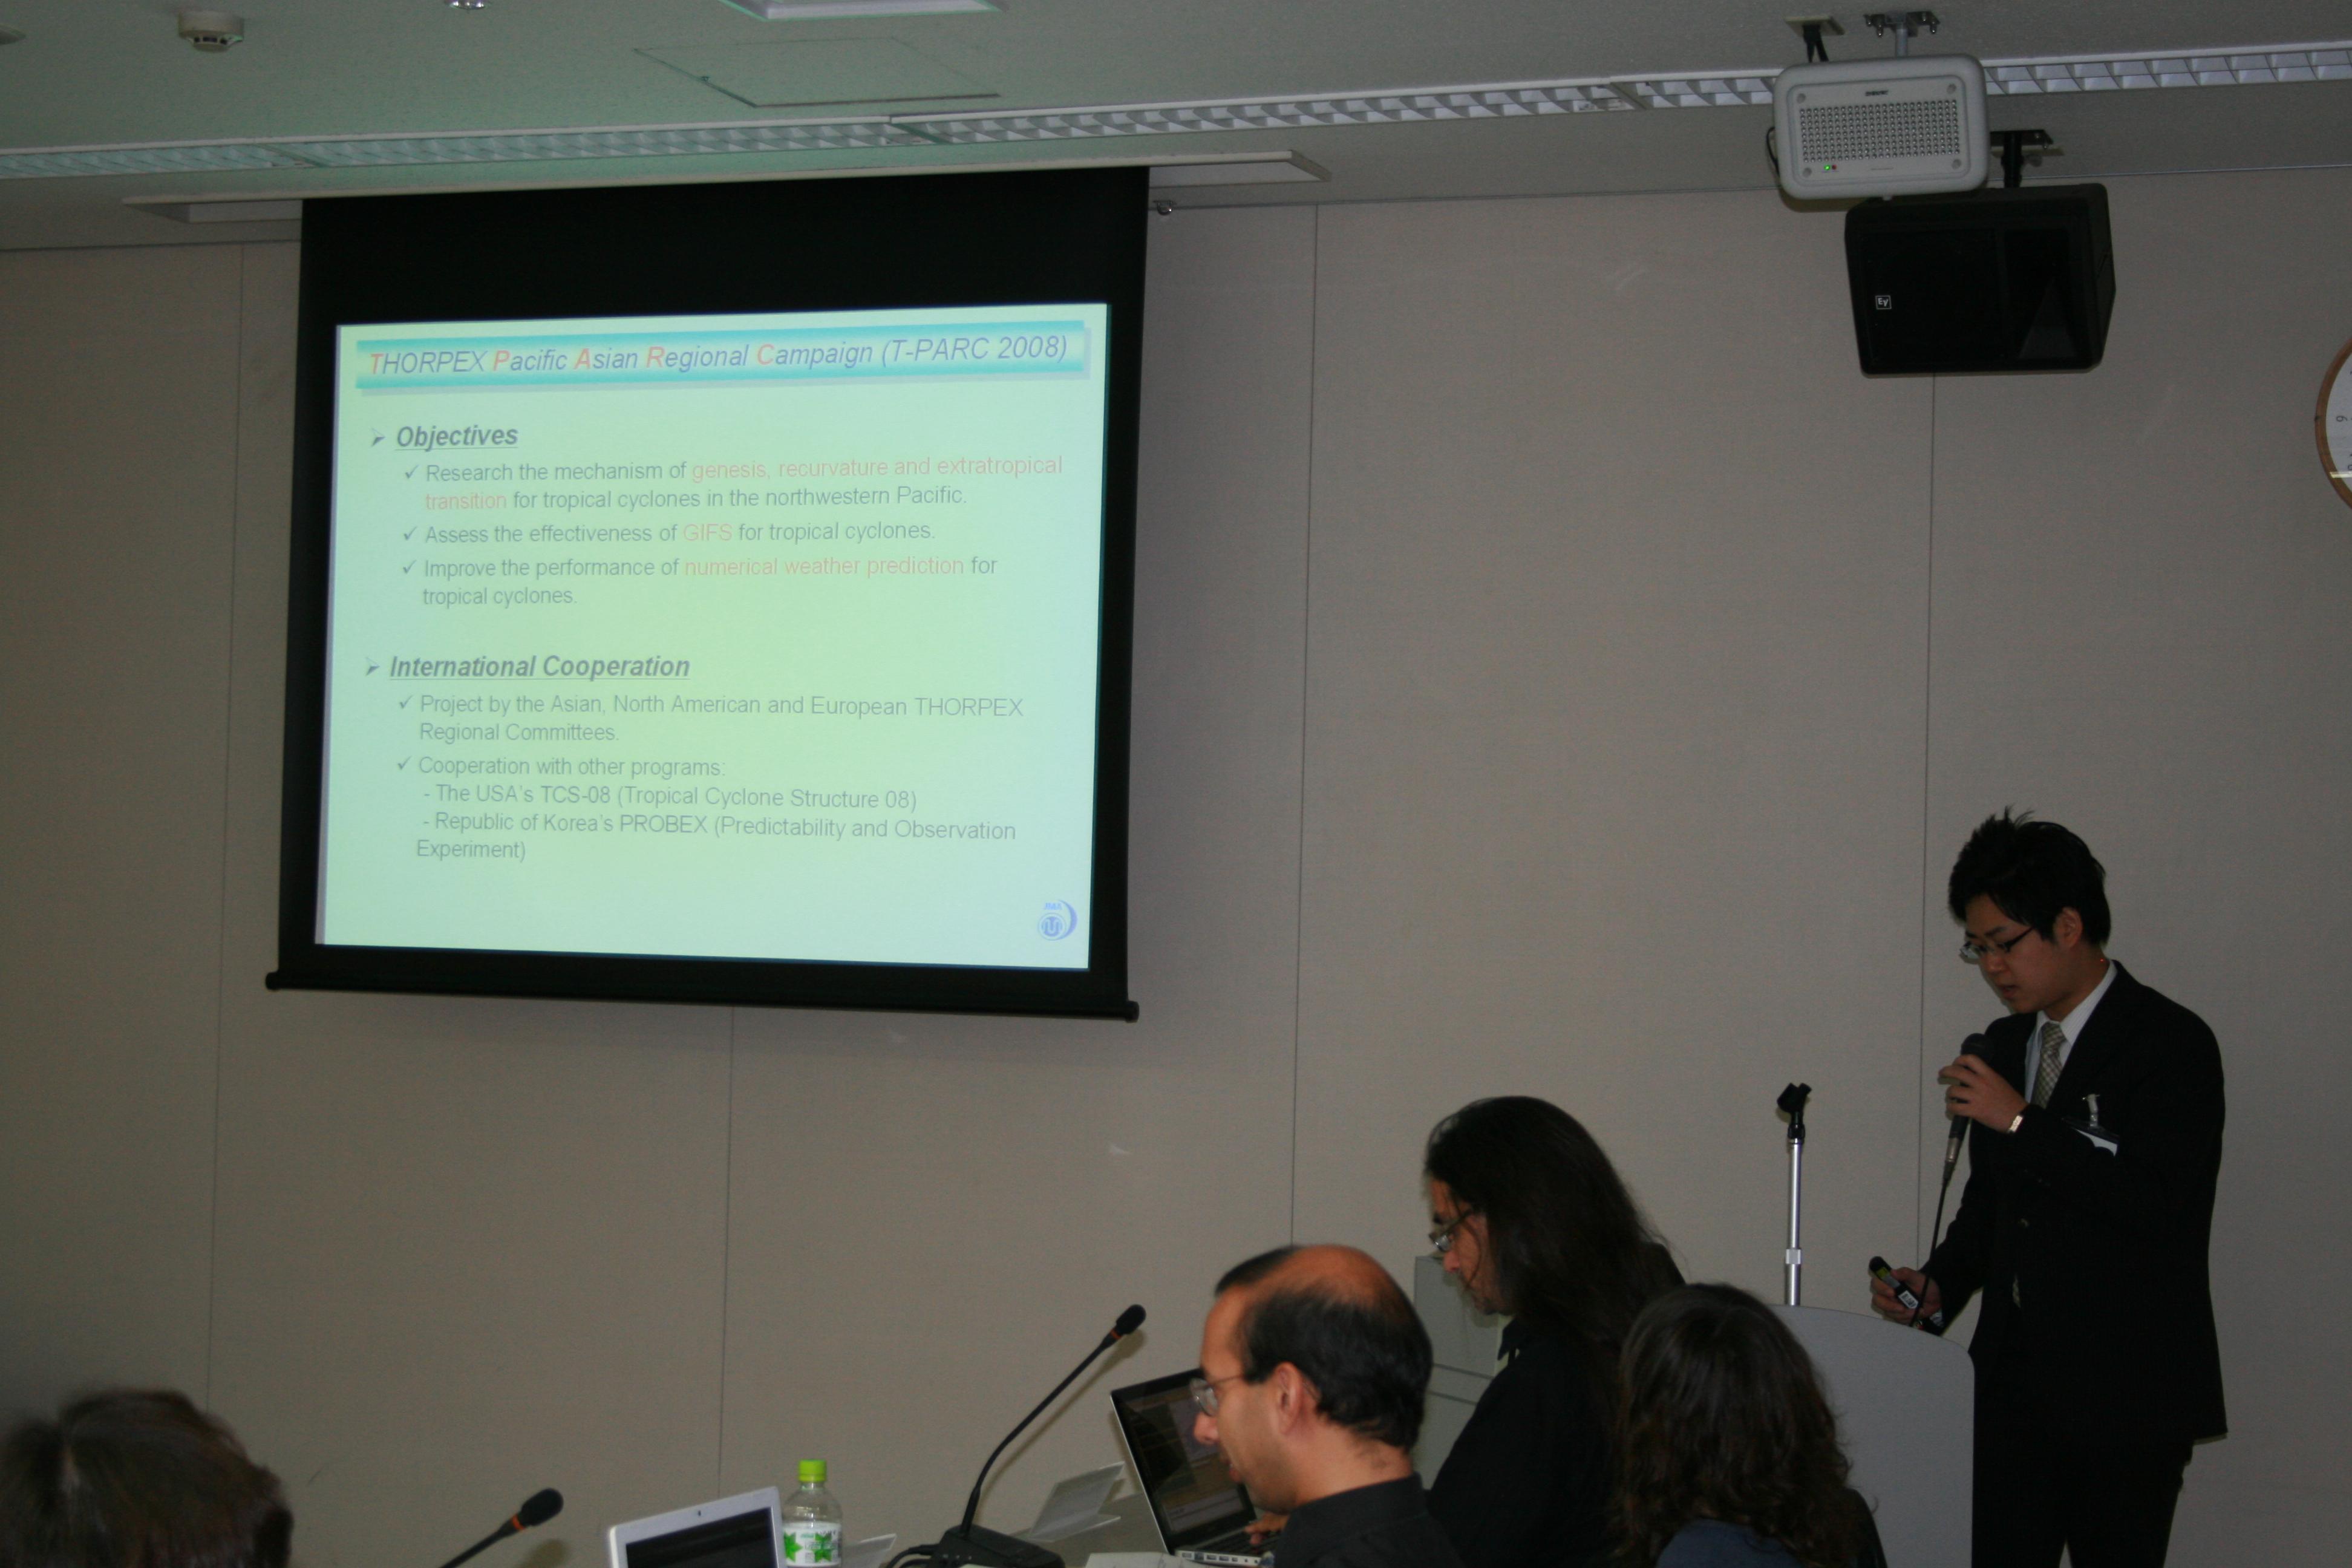 International Workshop on Advancement of Typhoon Track